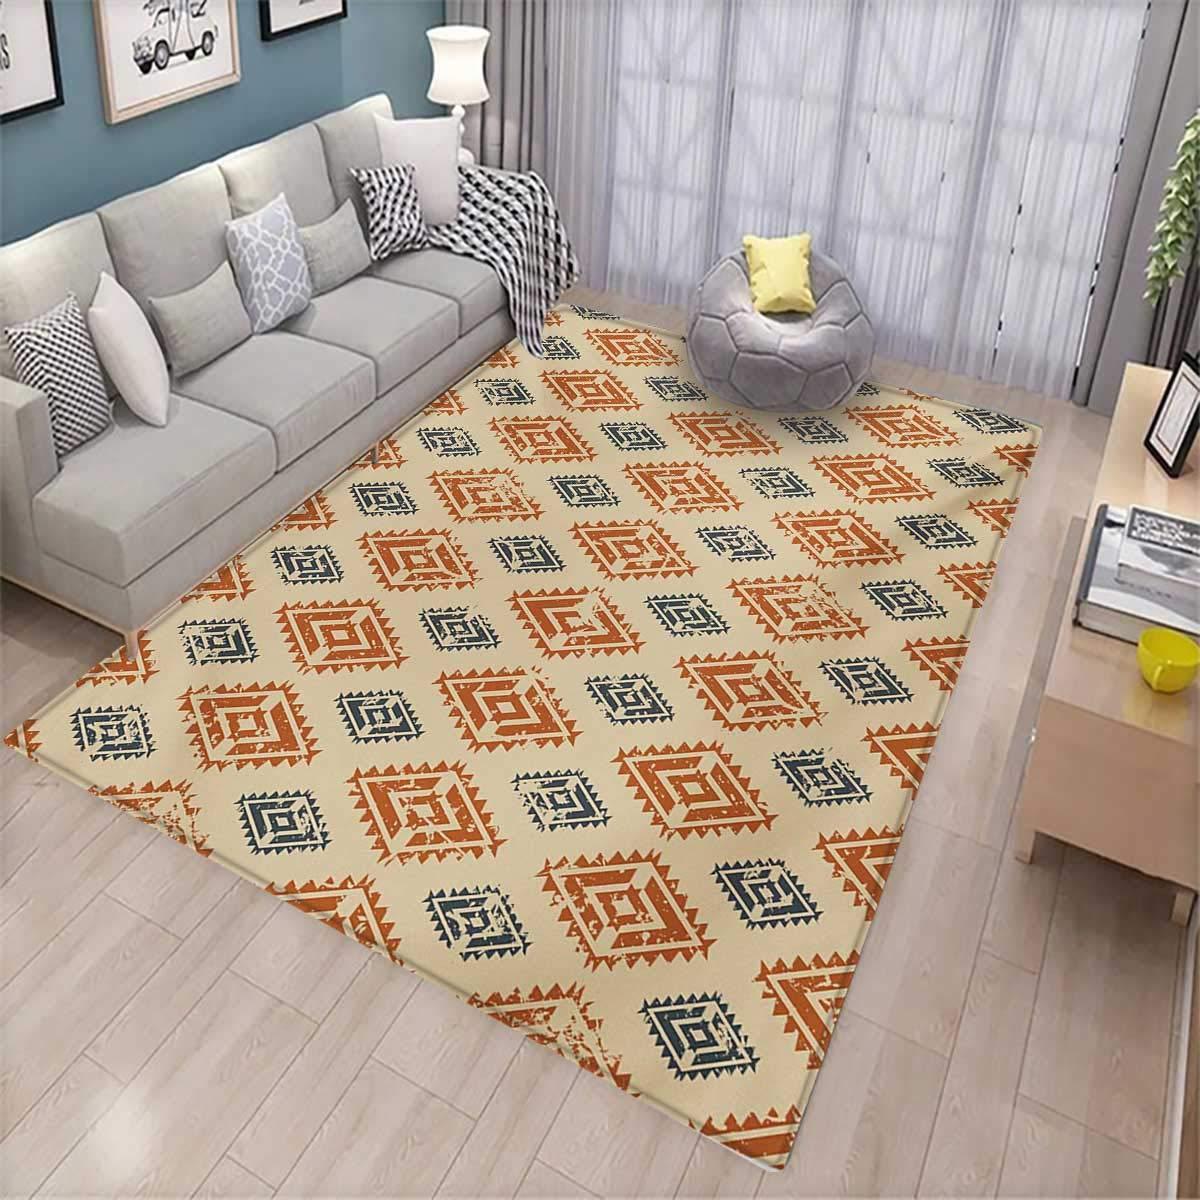 Zambia room home bedroom carpet floor mat ethnic tribal folk design with retro style aztec effects in pastel print floor mat pattern 58 x85 sand orange